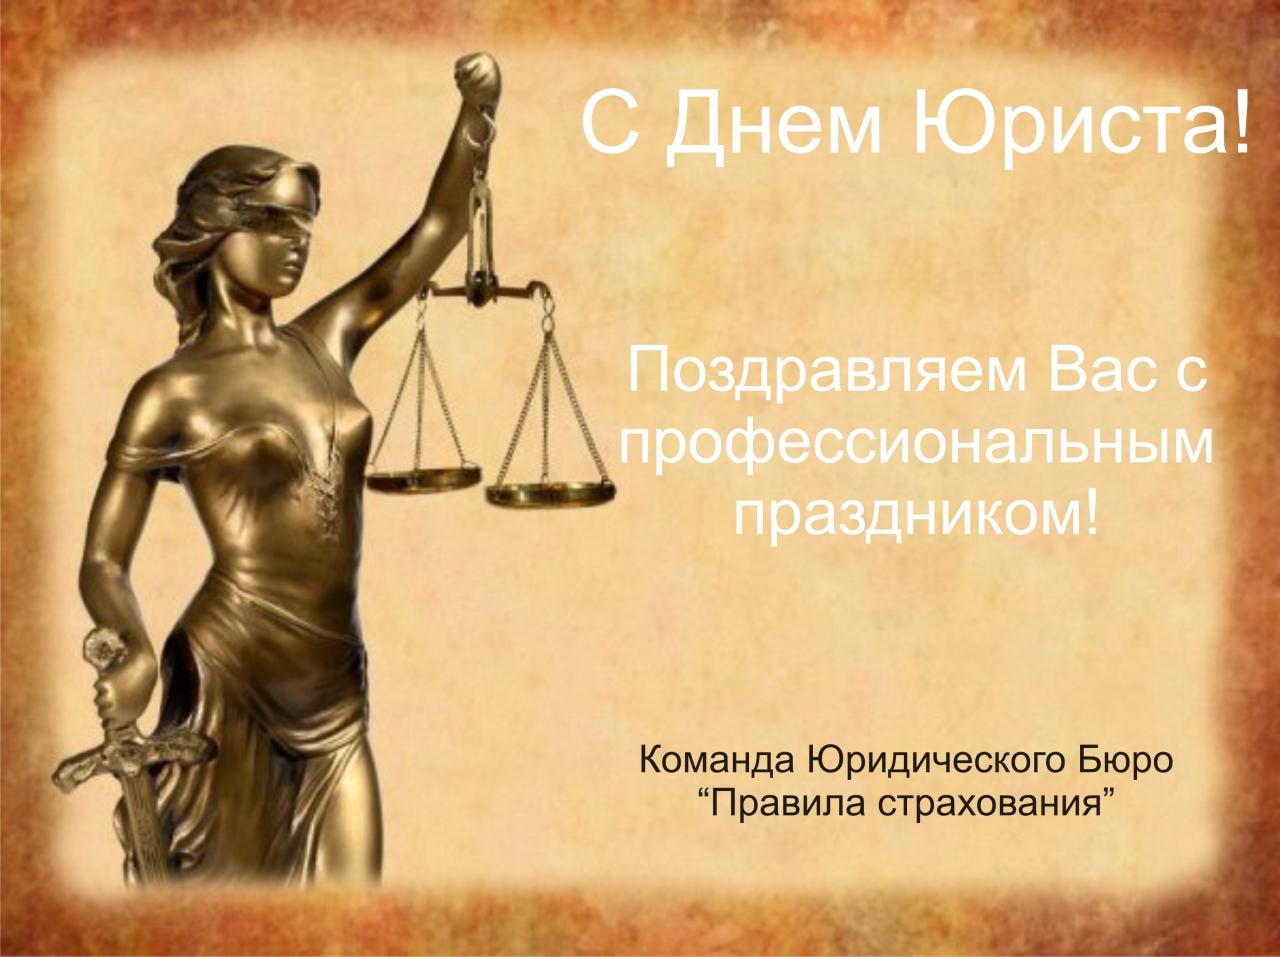 Днем, фон для открытки юристу